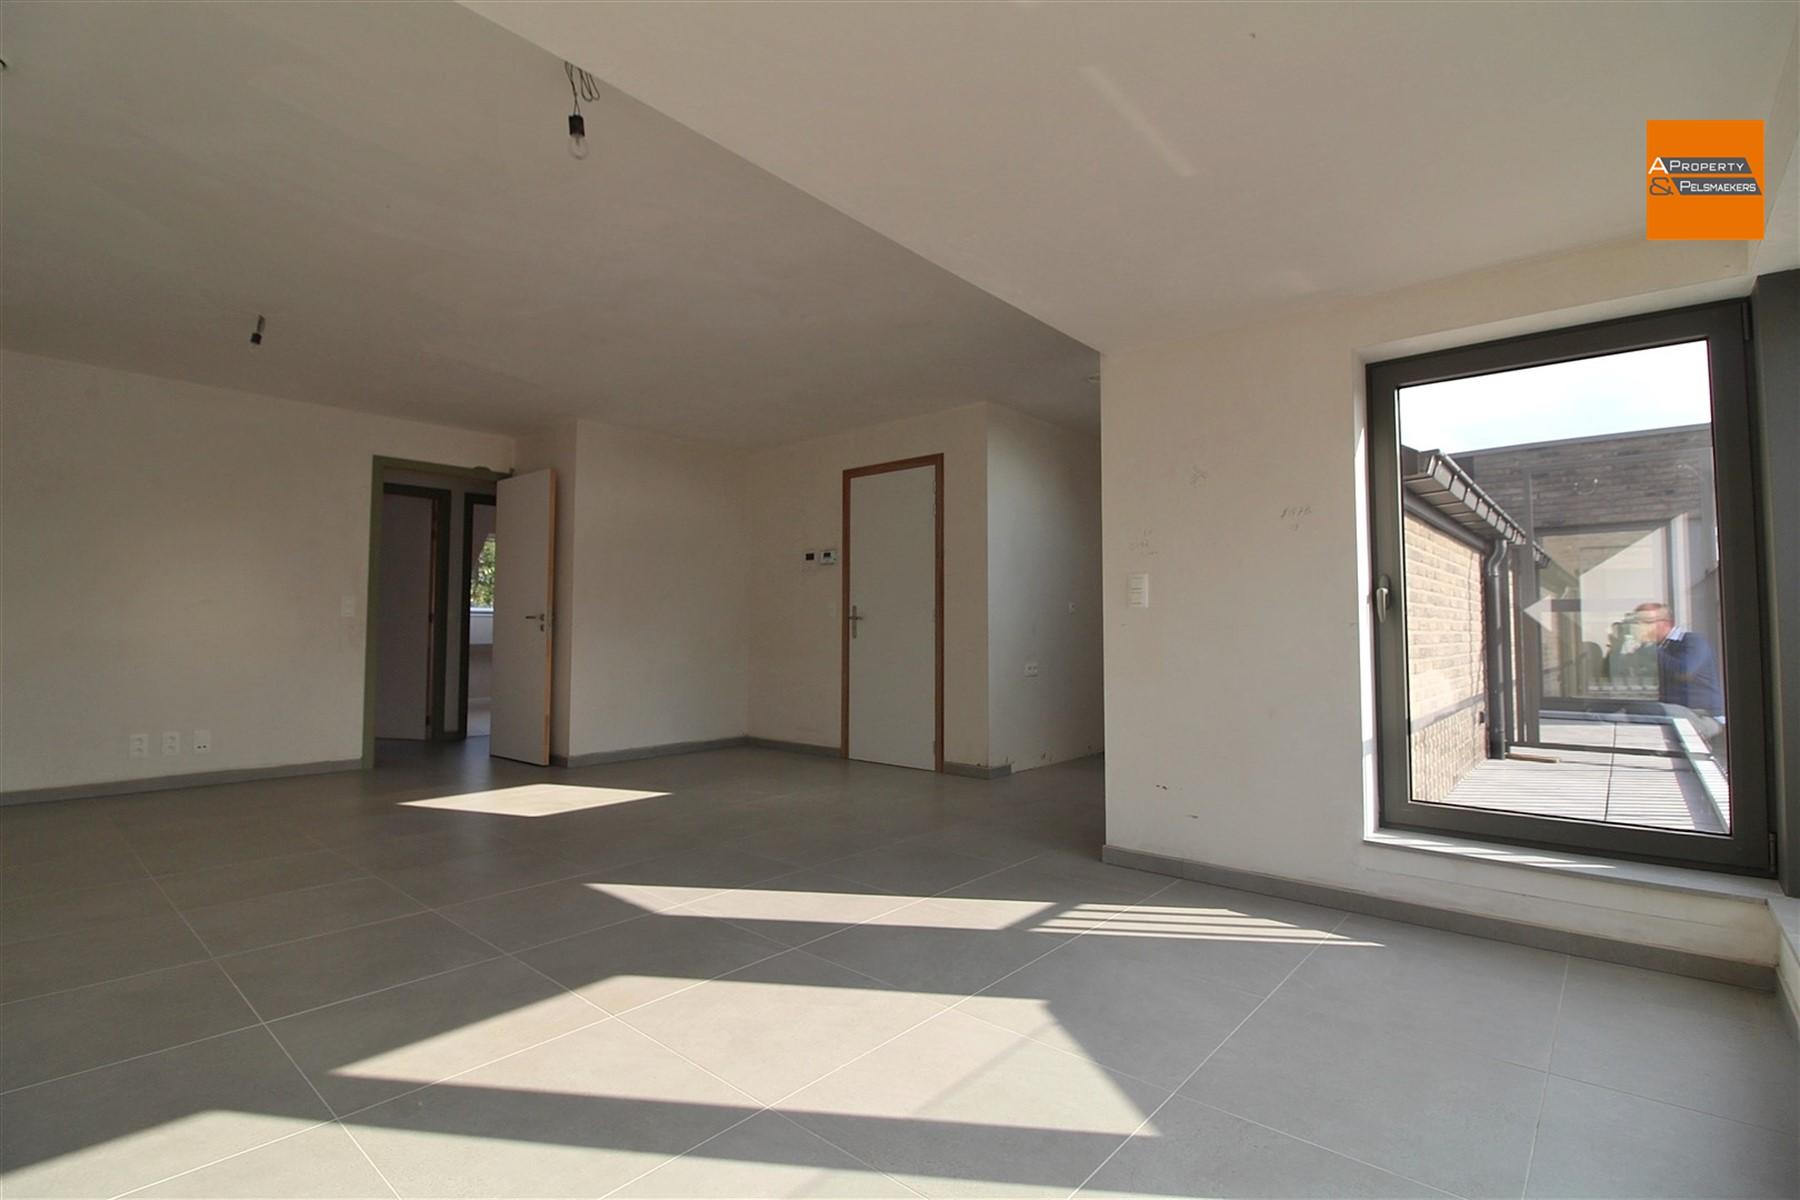 Foto 3 : Duplex/triplex in 3060 BERTEM (België) - Prijs € 319.000